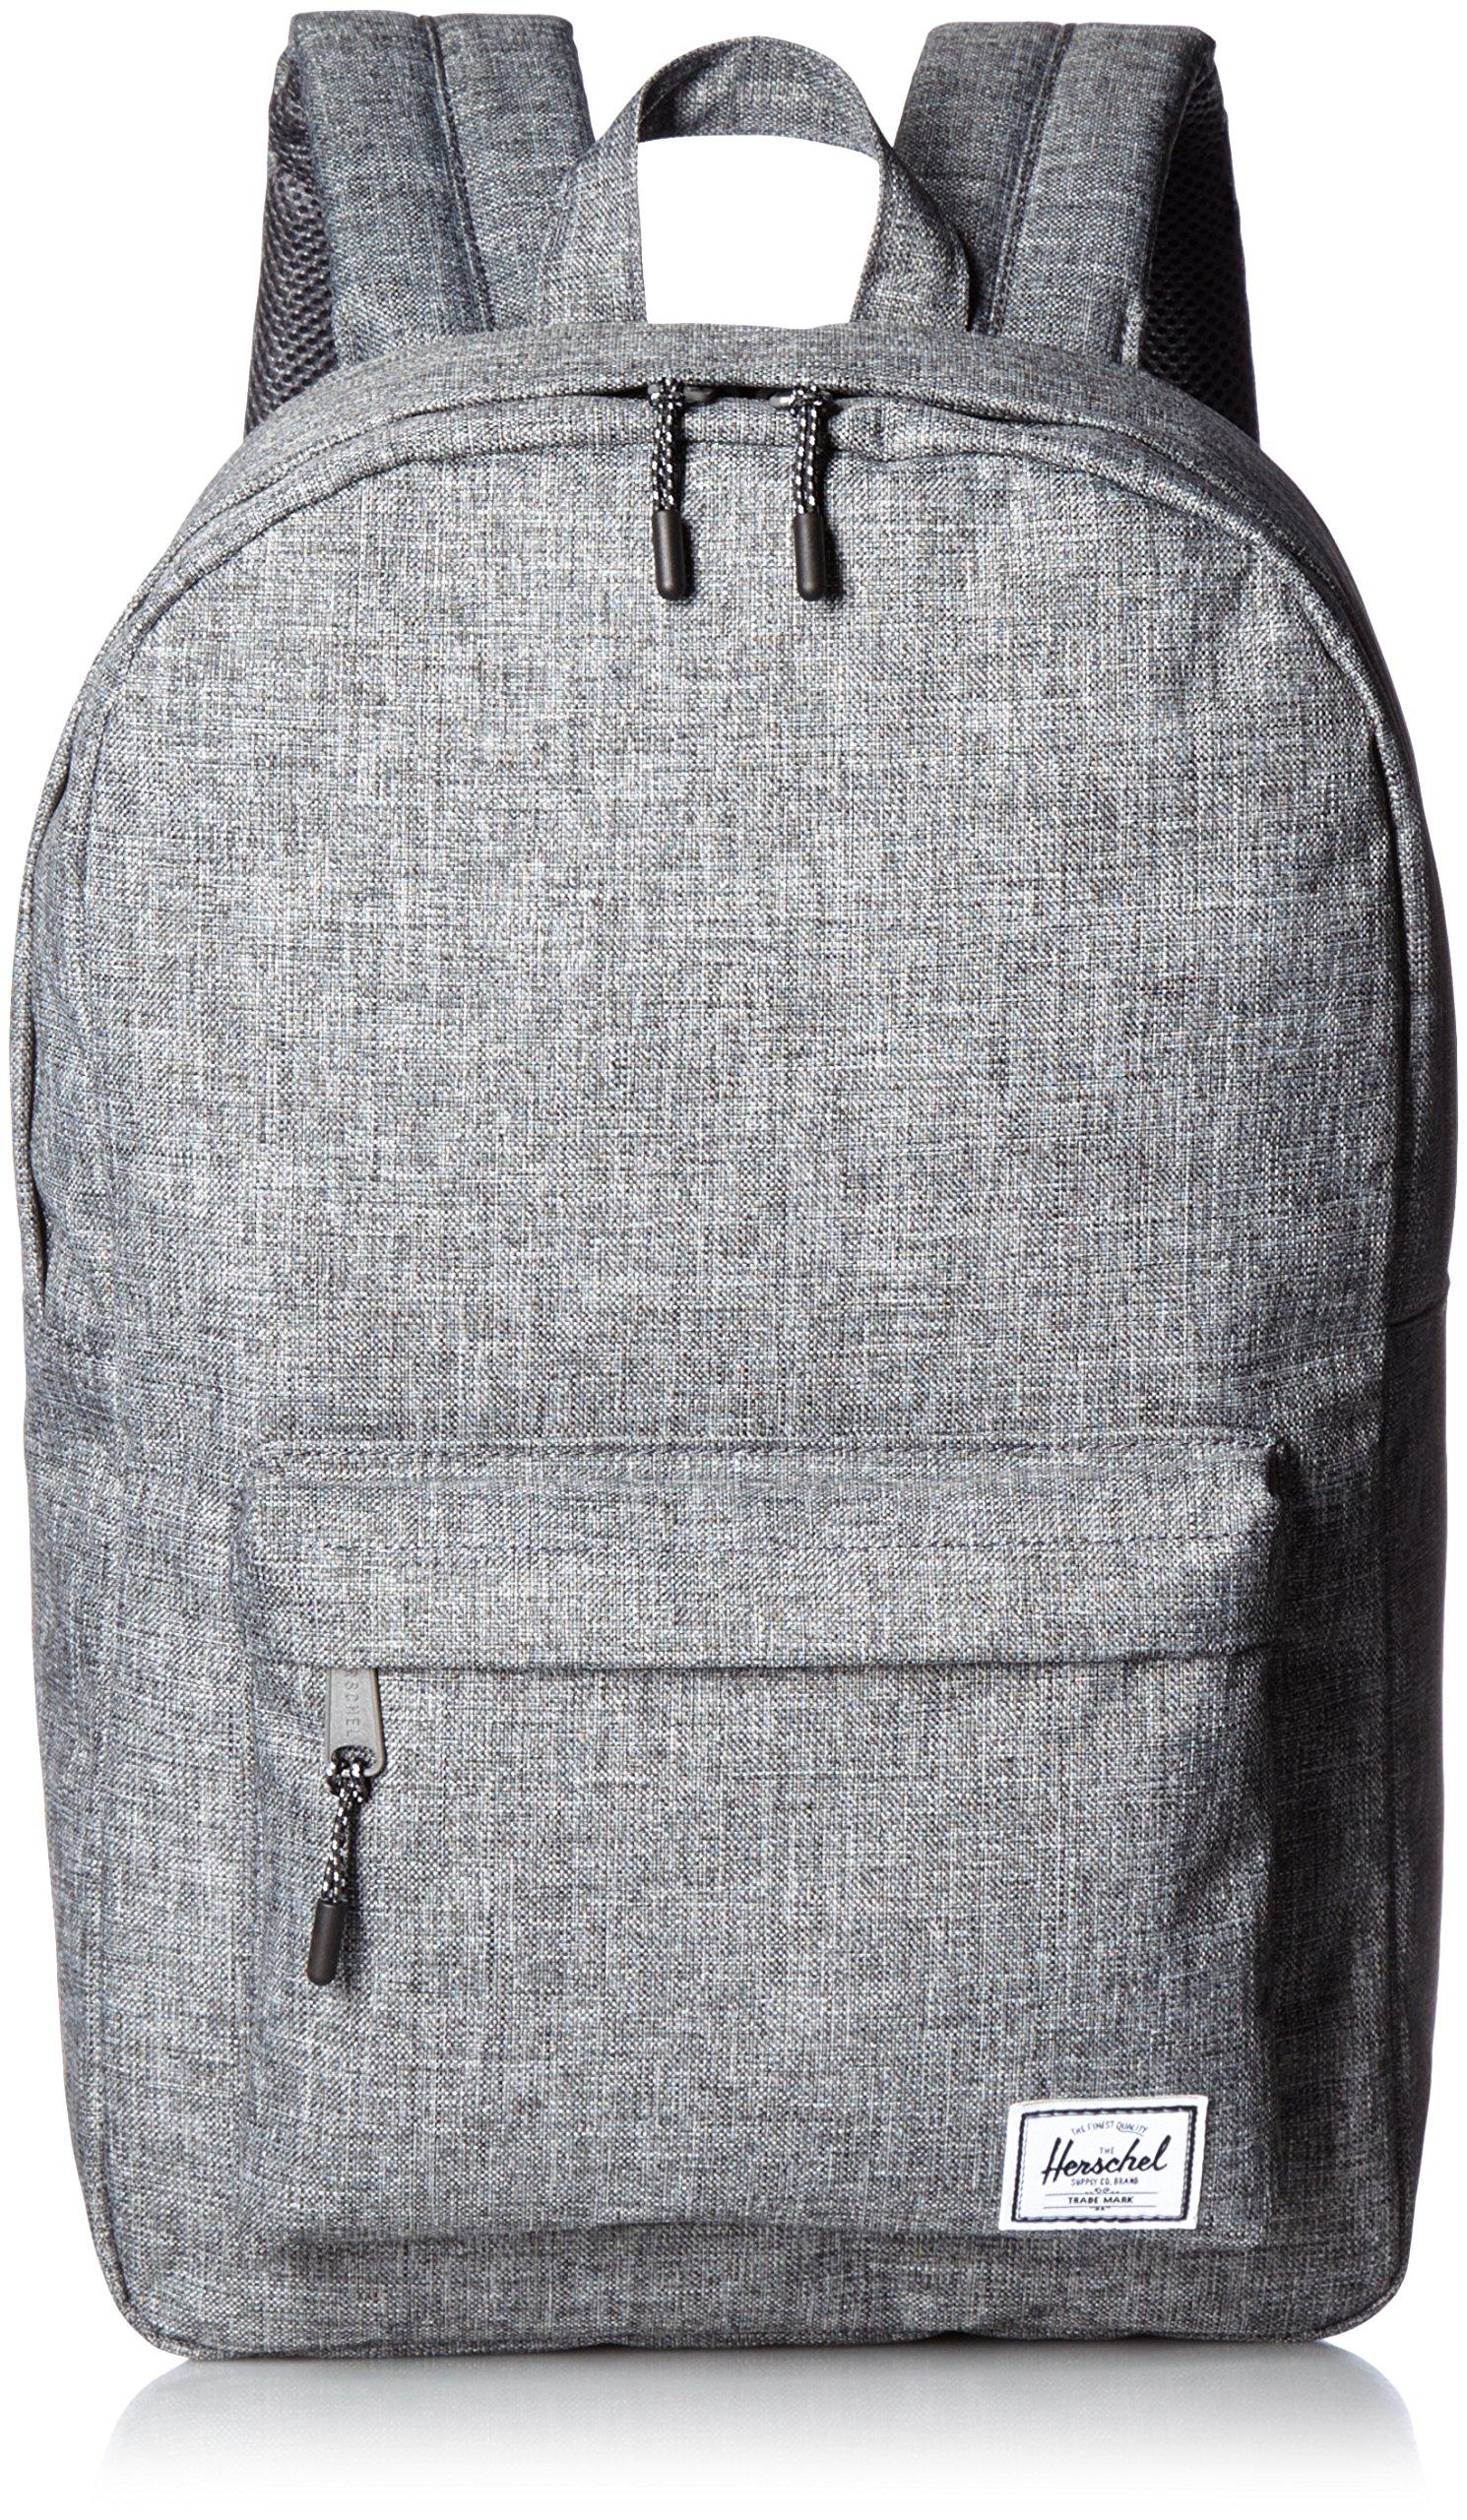 Herschel Supply Co. Classic Mid-Volume Backpack 1-Piece, Raven Crosshatch, One Size